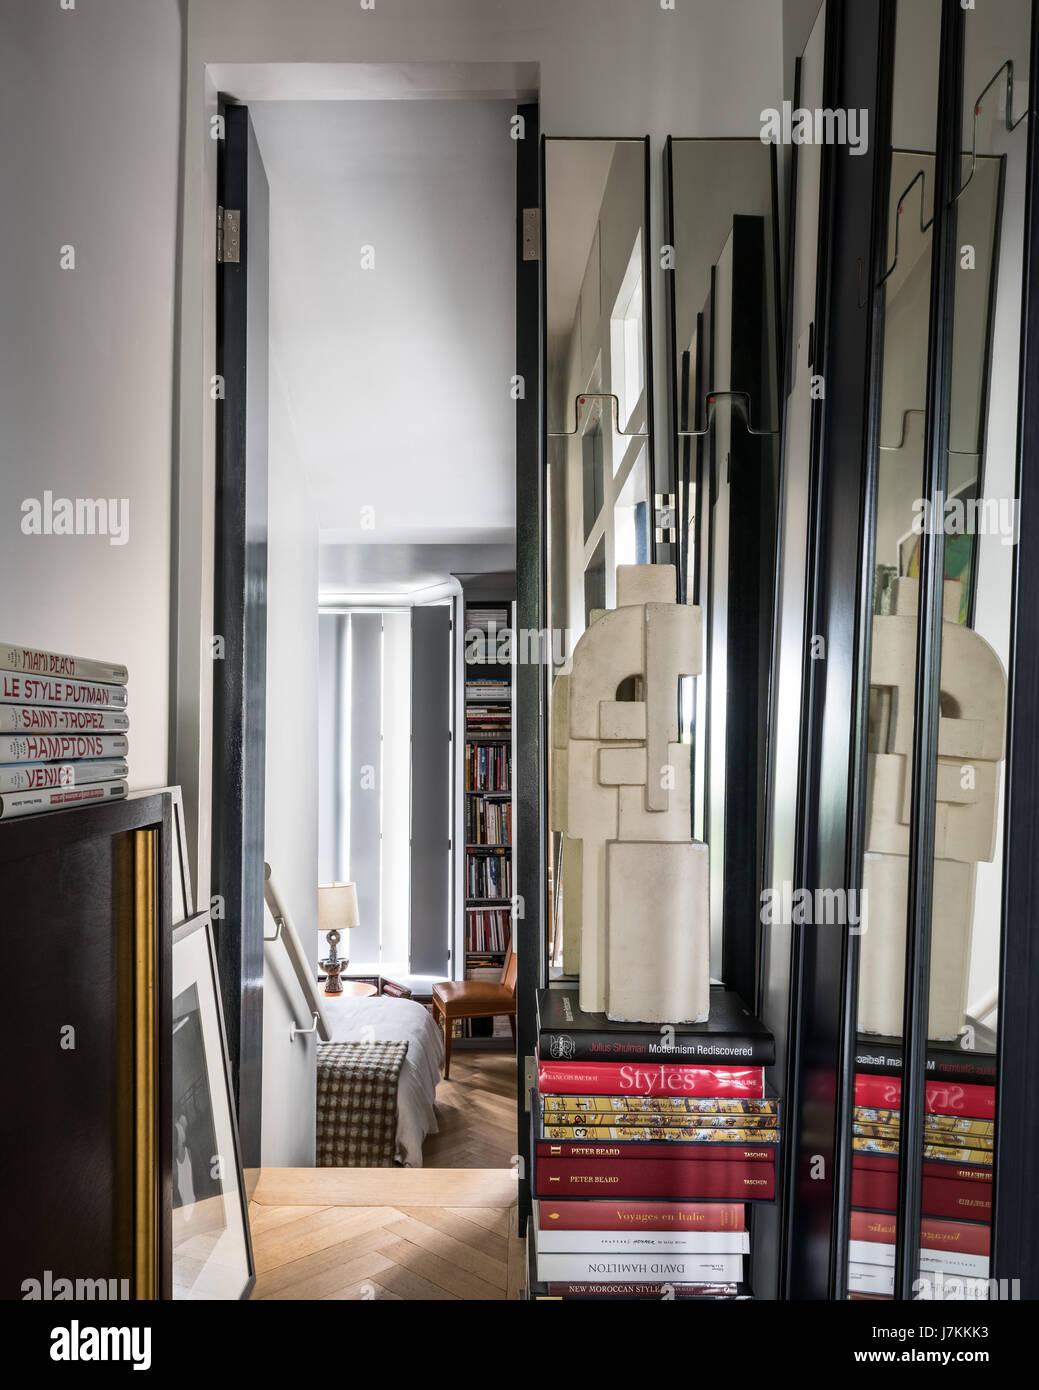 Books stacked at doorway to split-level bedroom - Stock Image